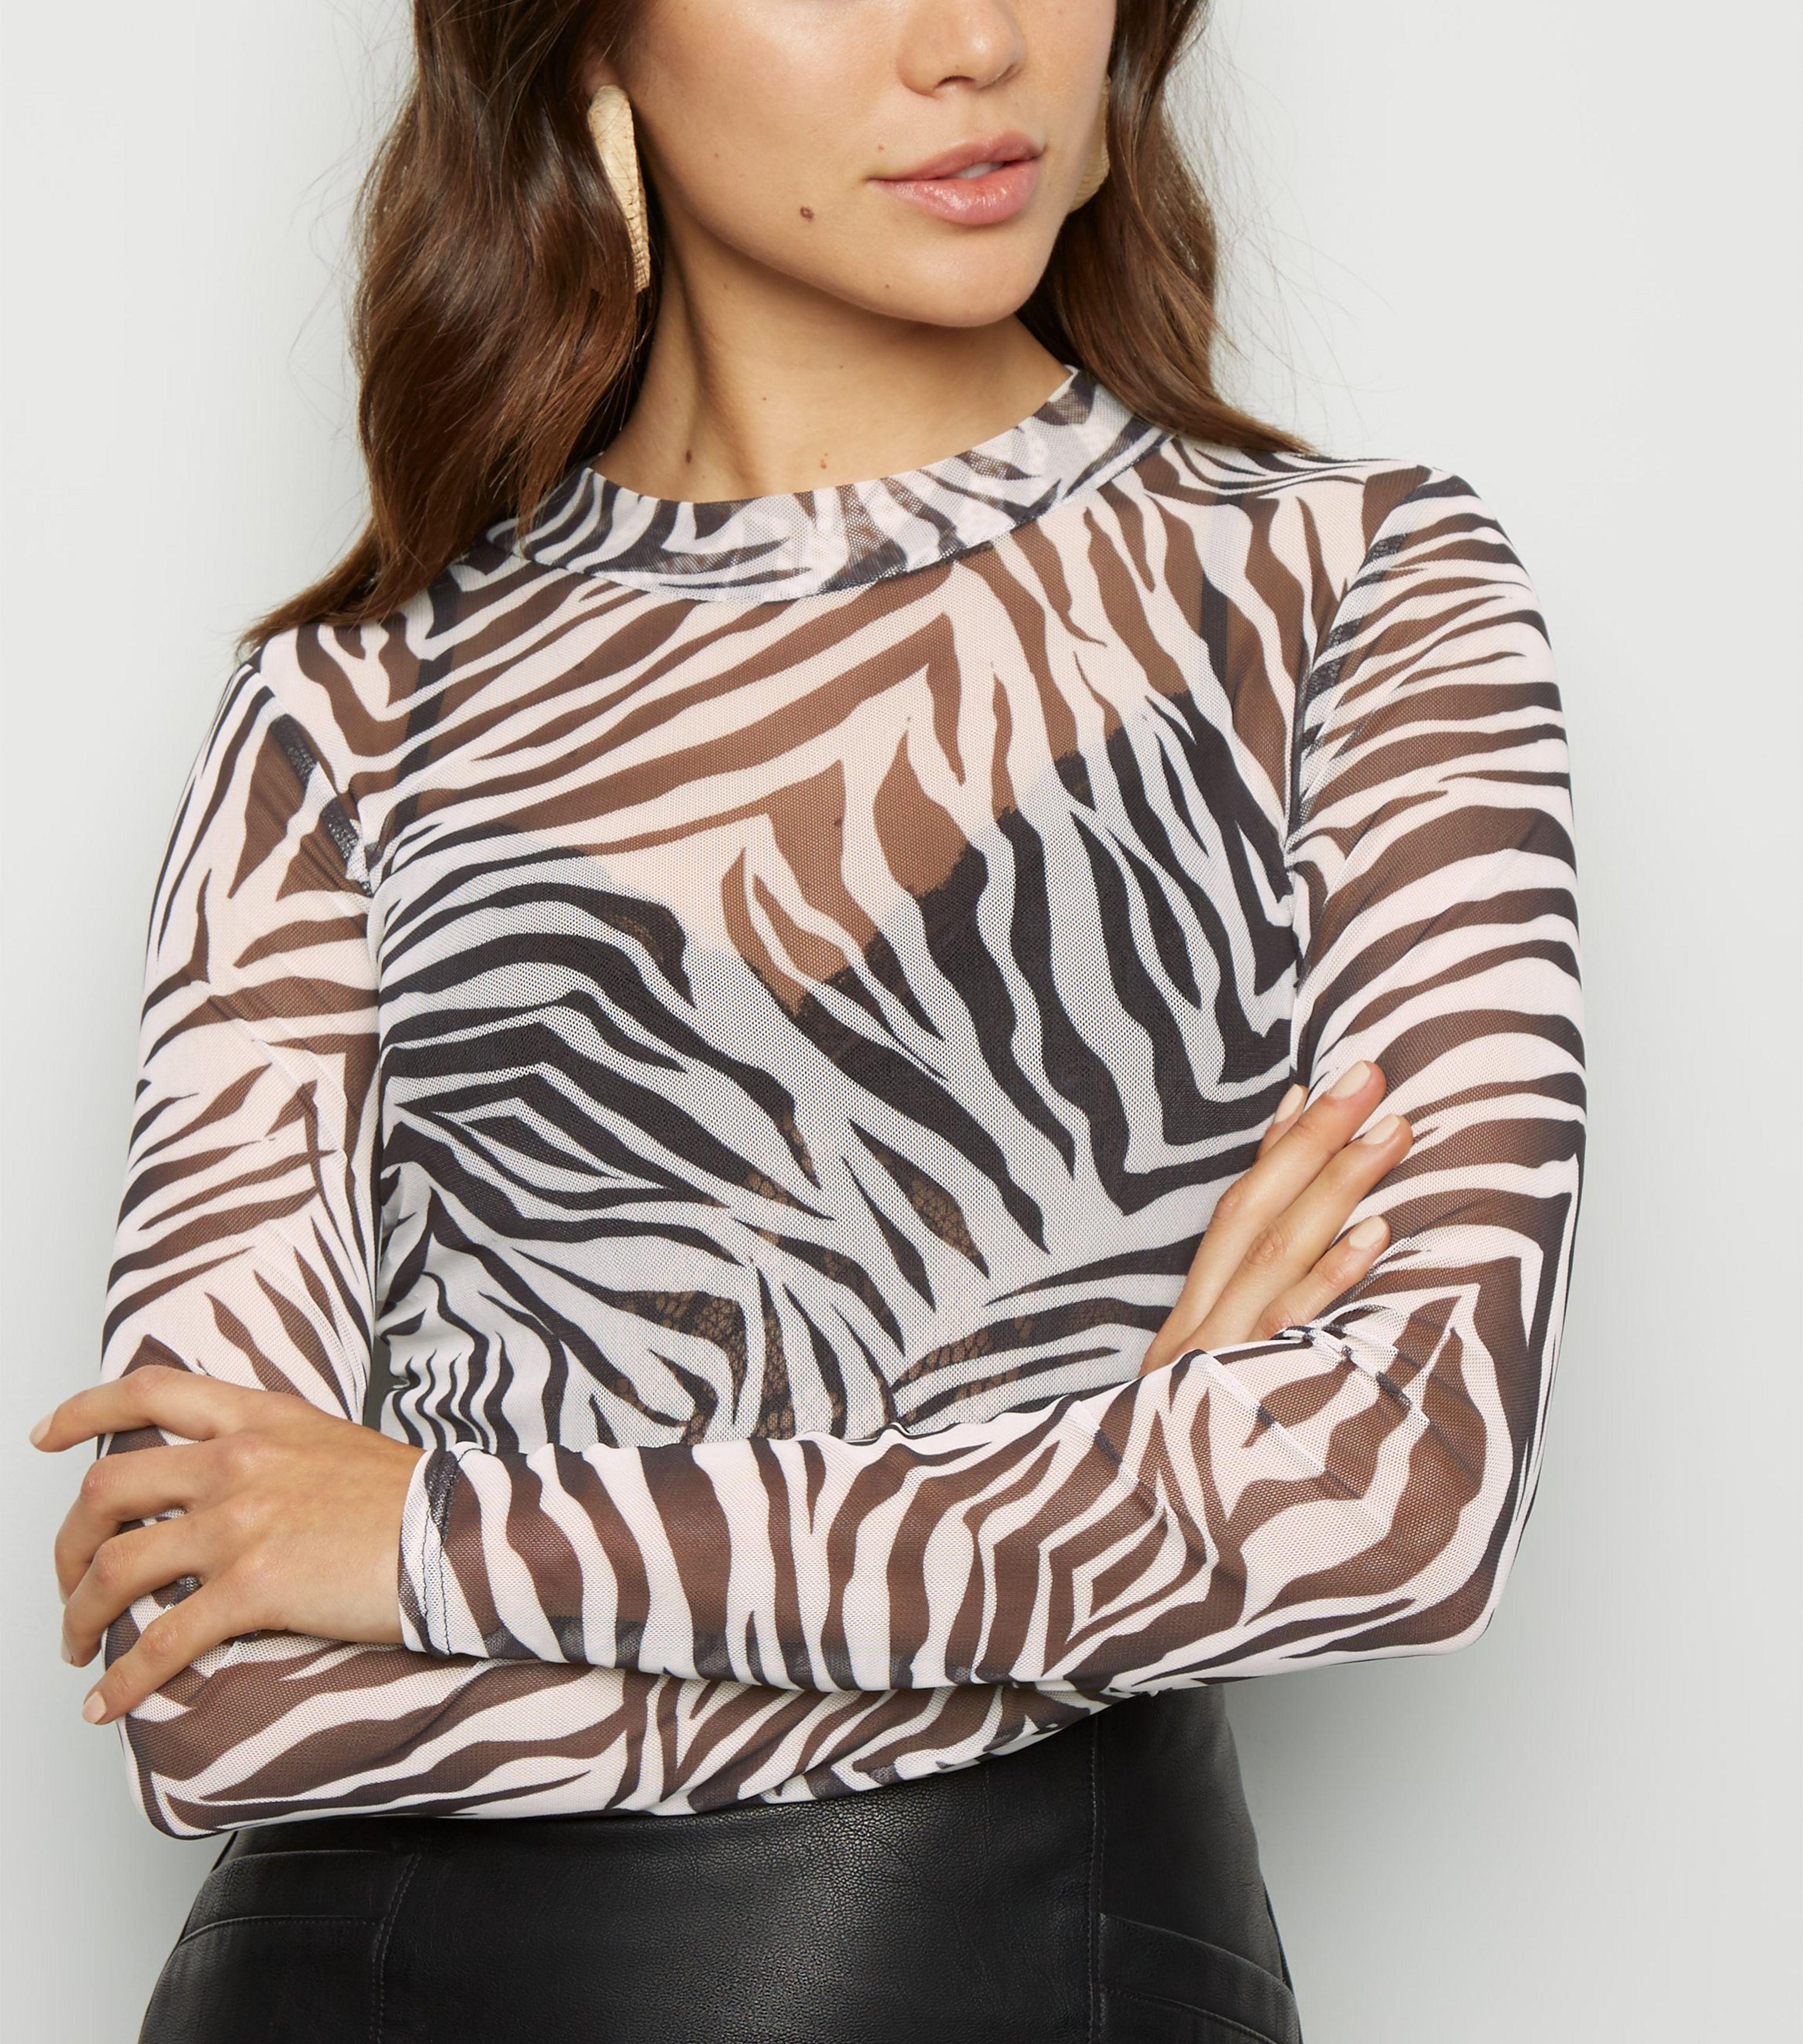 6655bb43785e New Look Black Zebra Print Mesh Long Sleeve Top in Black - Lyst